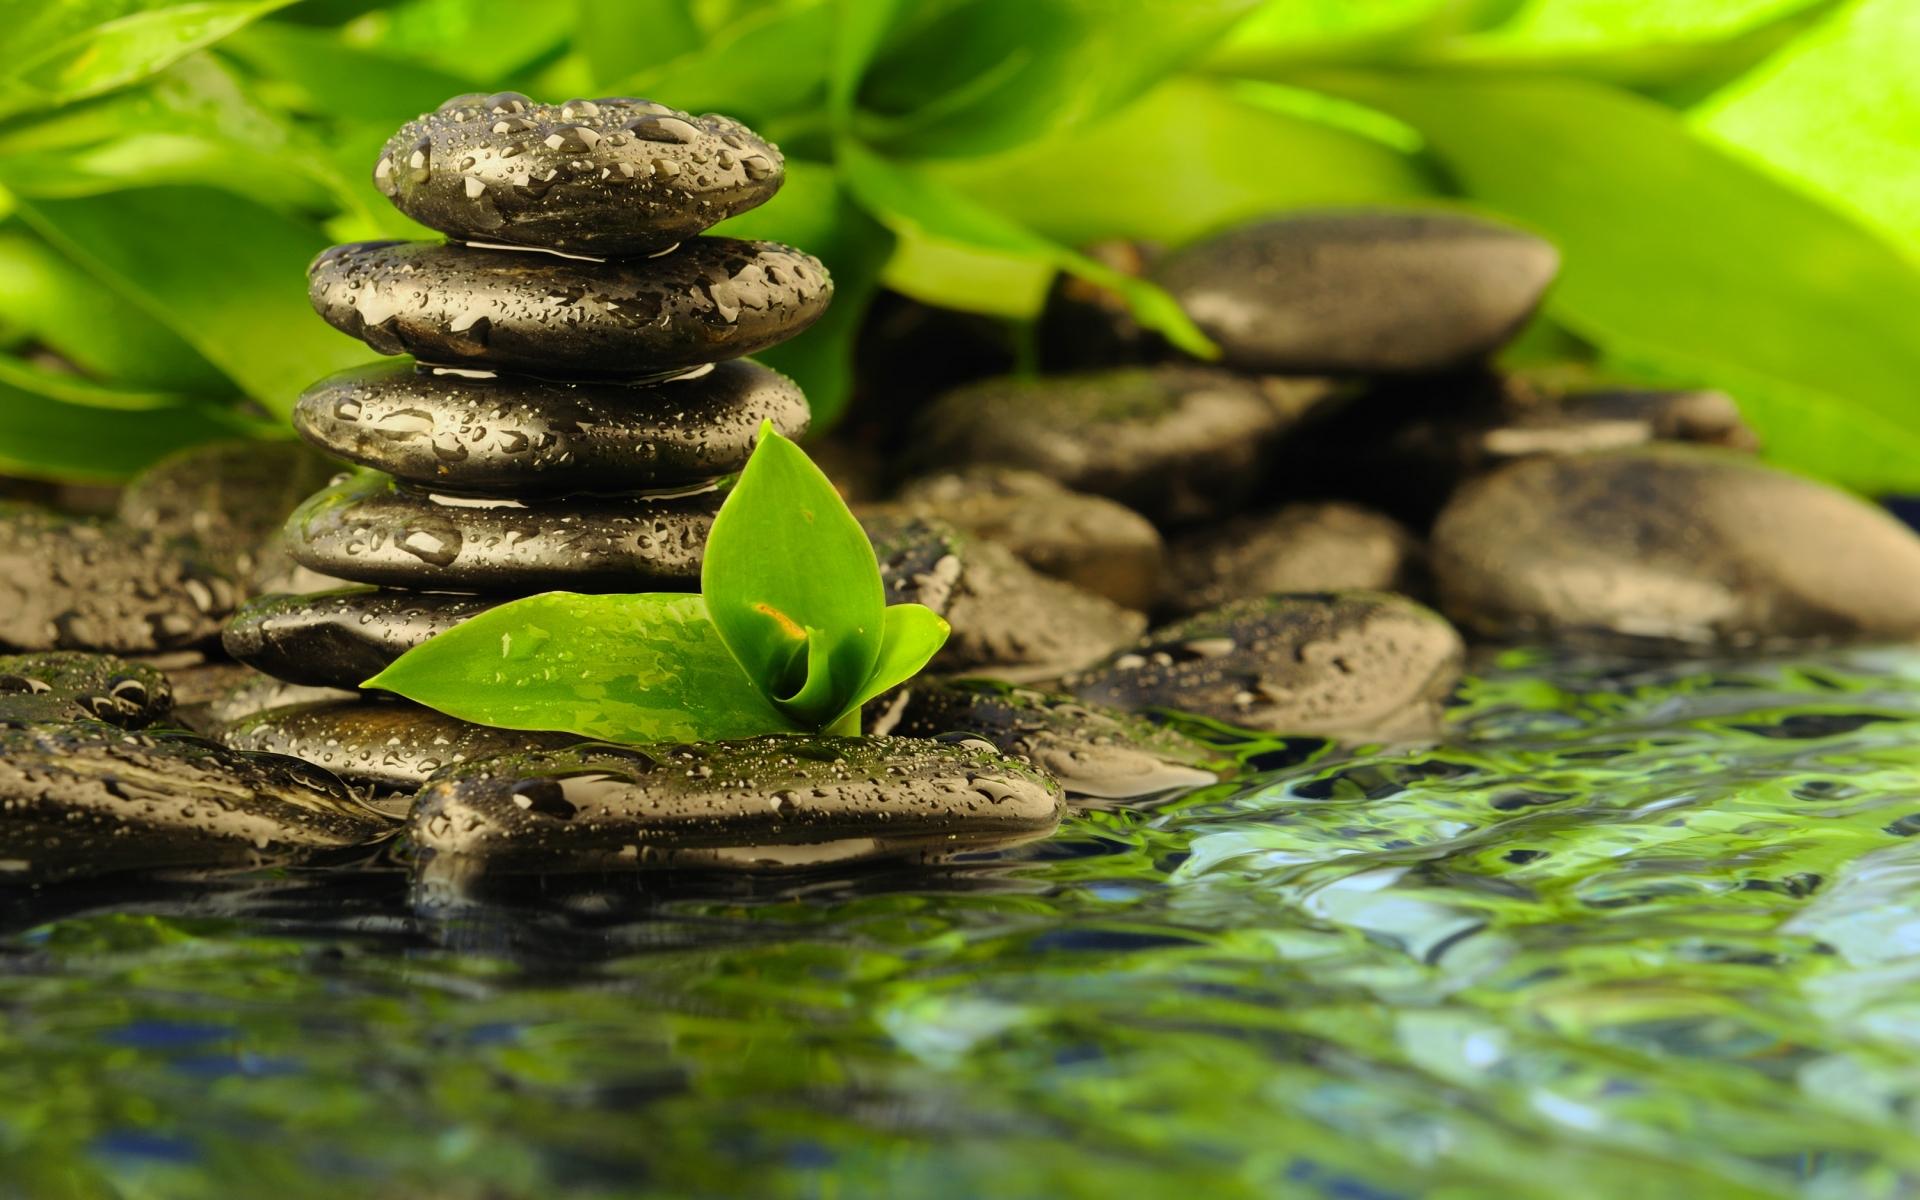 zen religion peace solitude water reflection rocks drops leaves 1920x1200